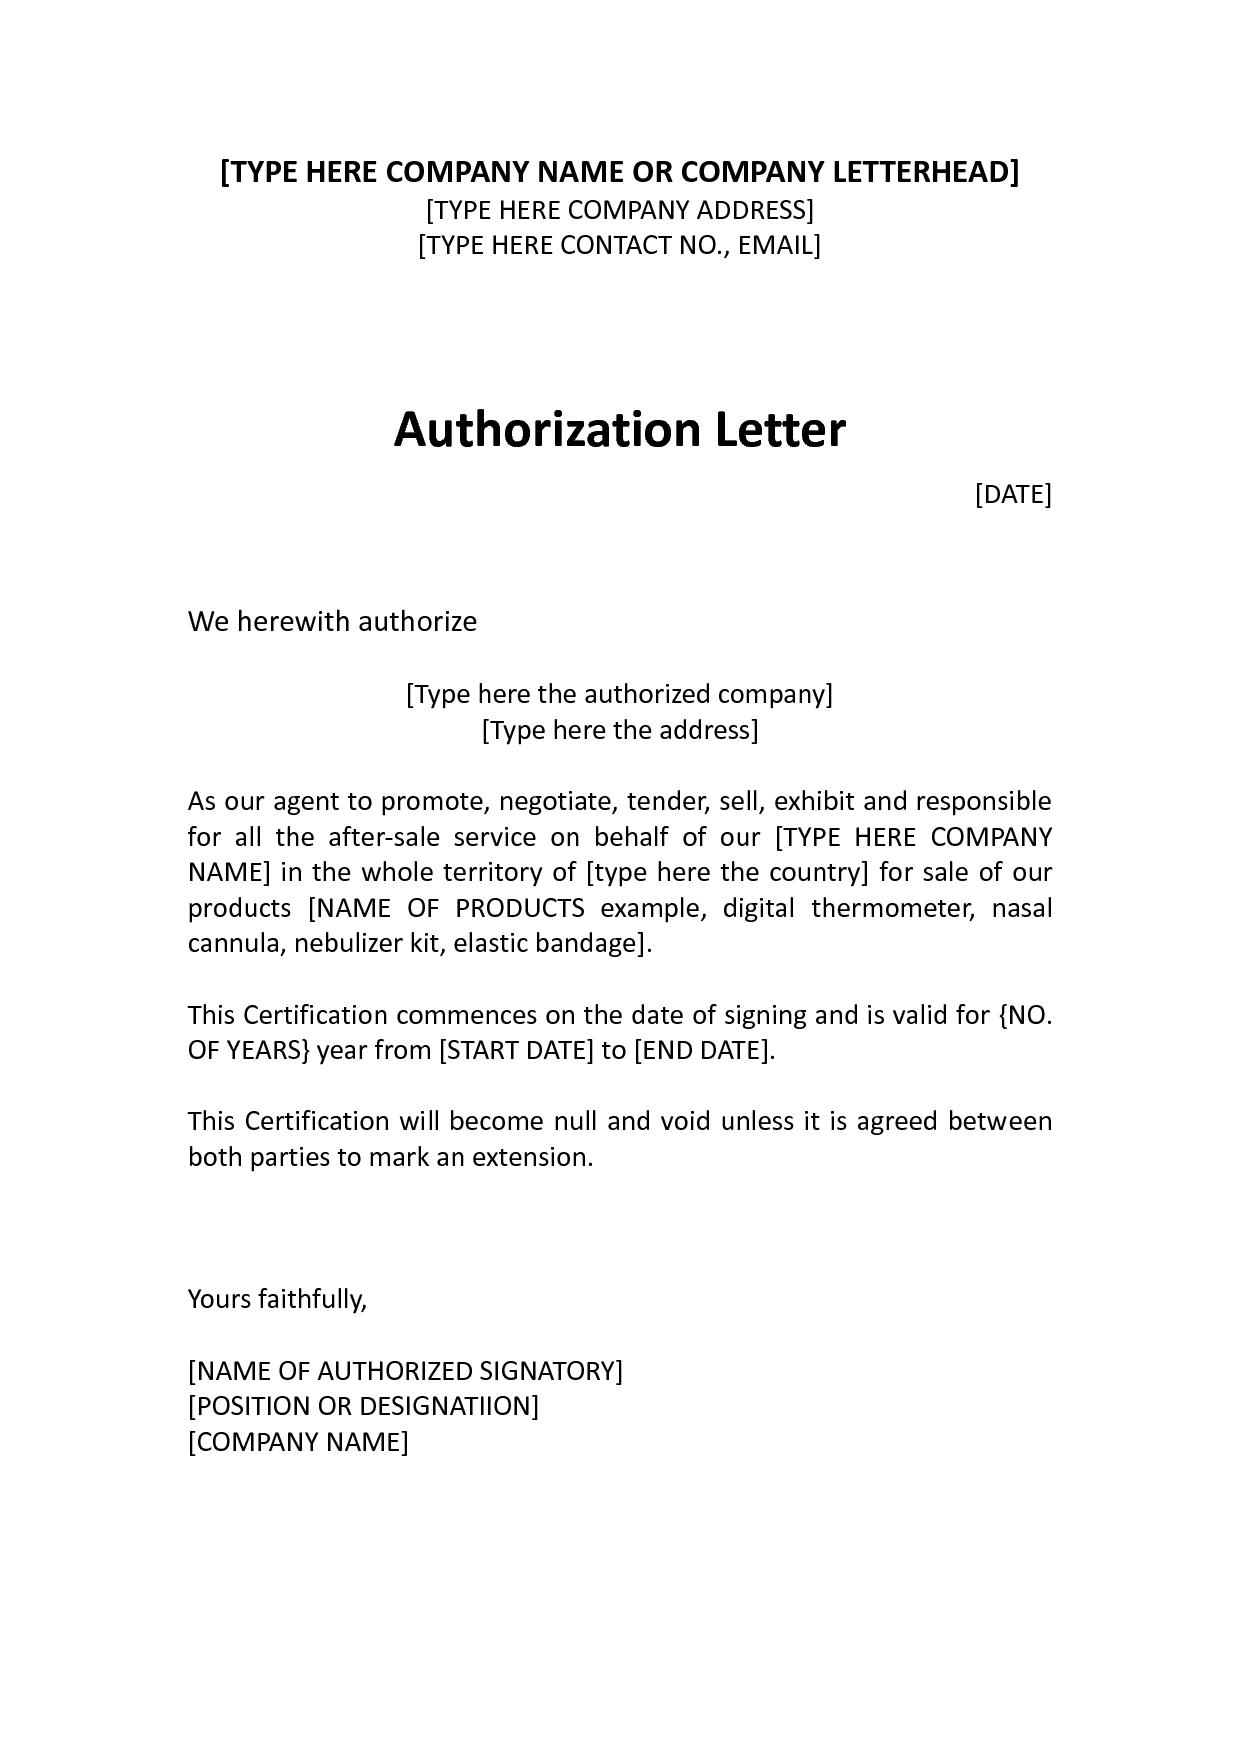 Proof Of Child Support Letter Template - Authorization Distributor Letter Sample Distributor Dealer